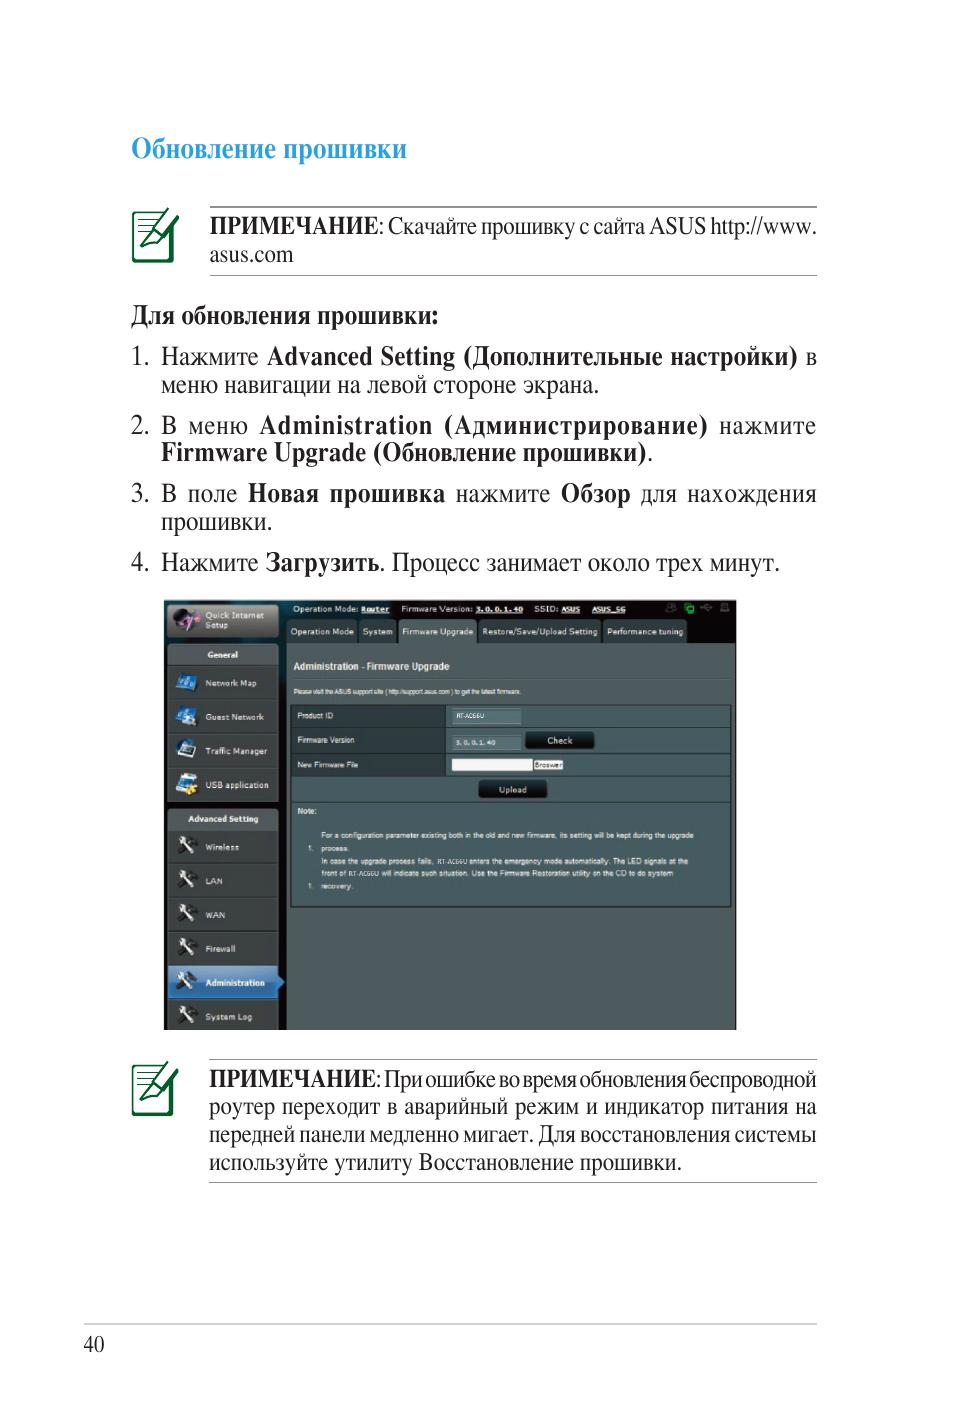 инструкция по перепрошивке huawei sonic - fasdom.ru